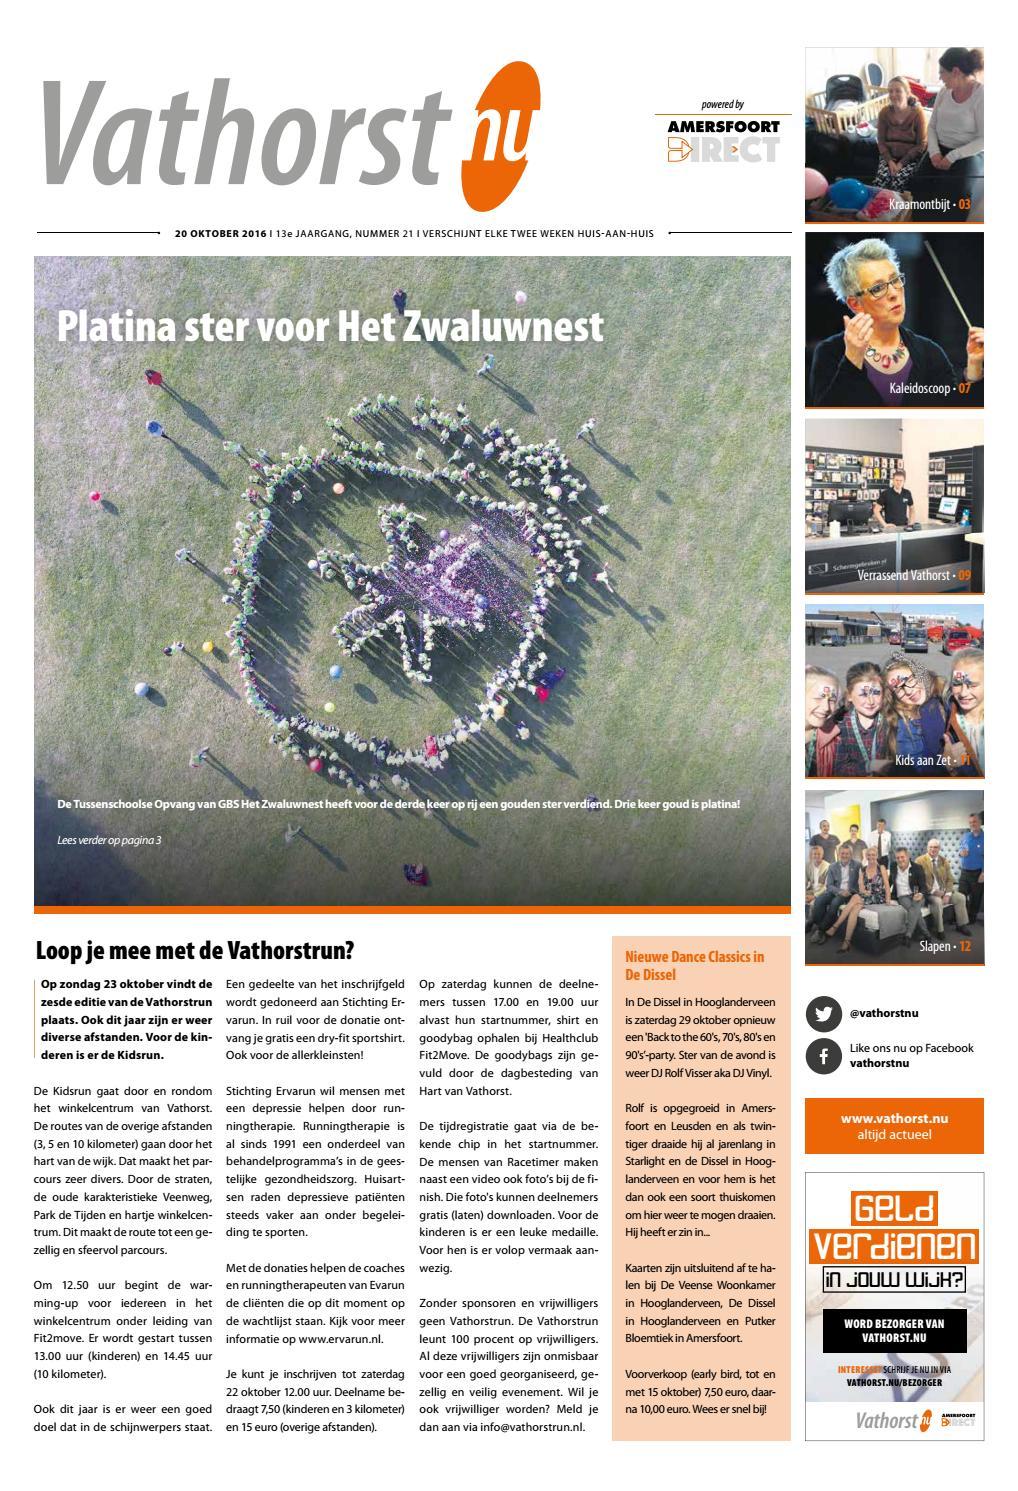 Vathorst.nu 20 oktober 2016 by Weekbladen Groep Amersfoort - issuu